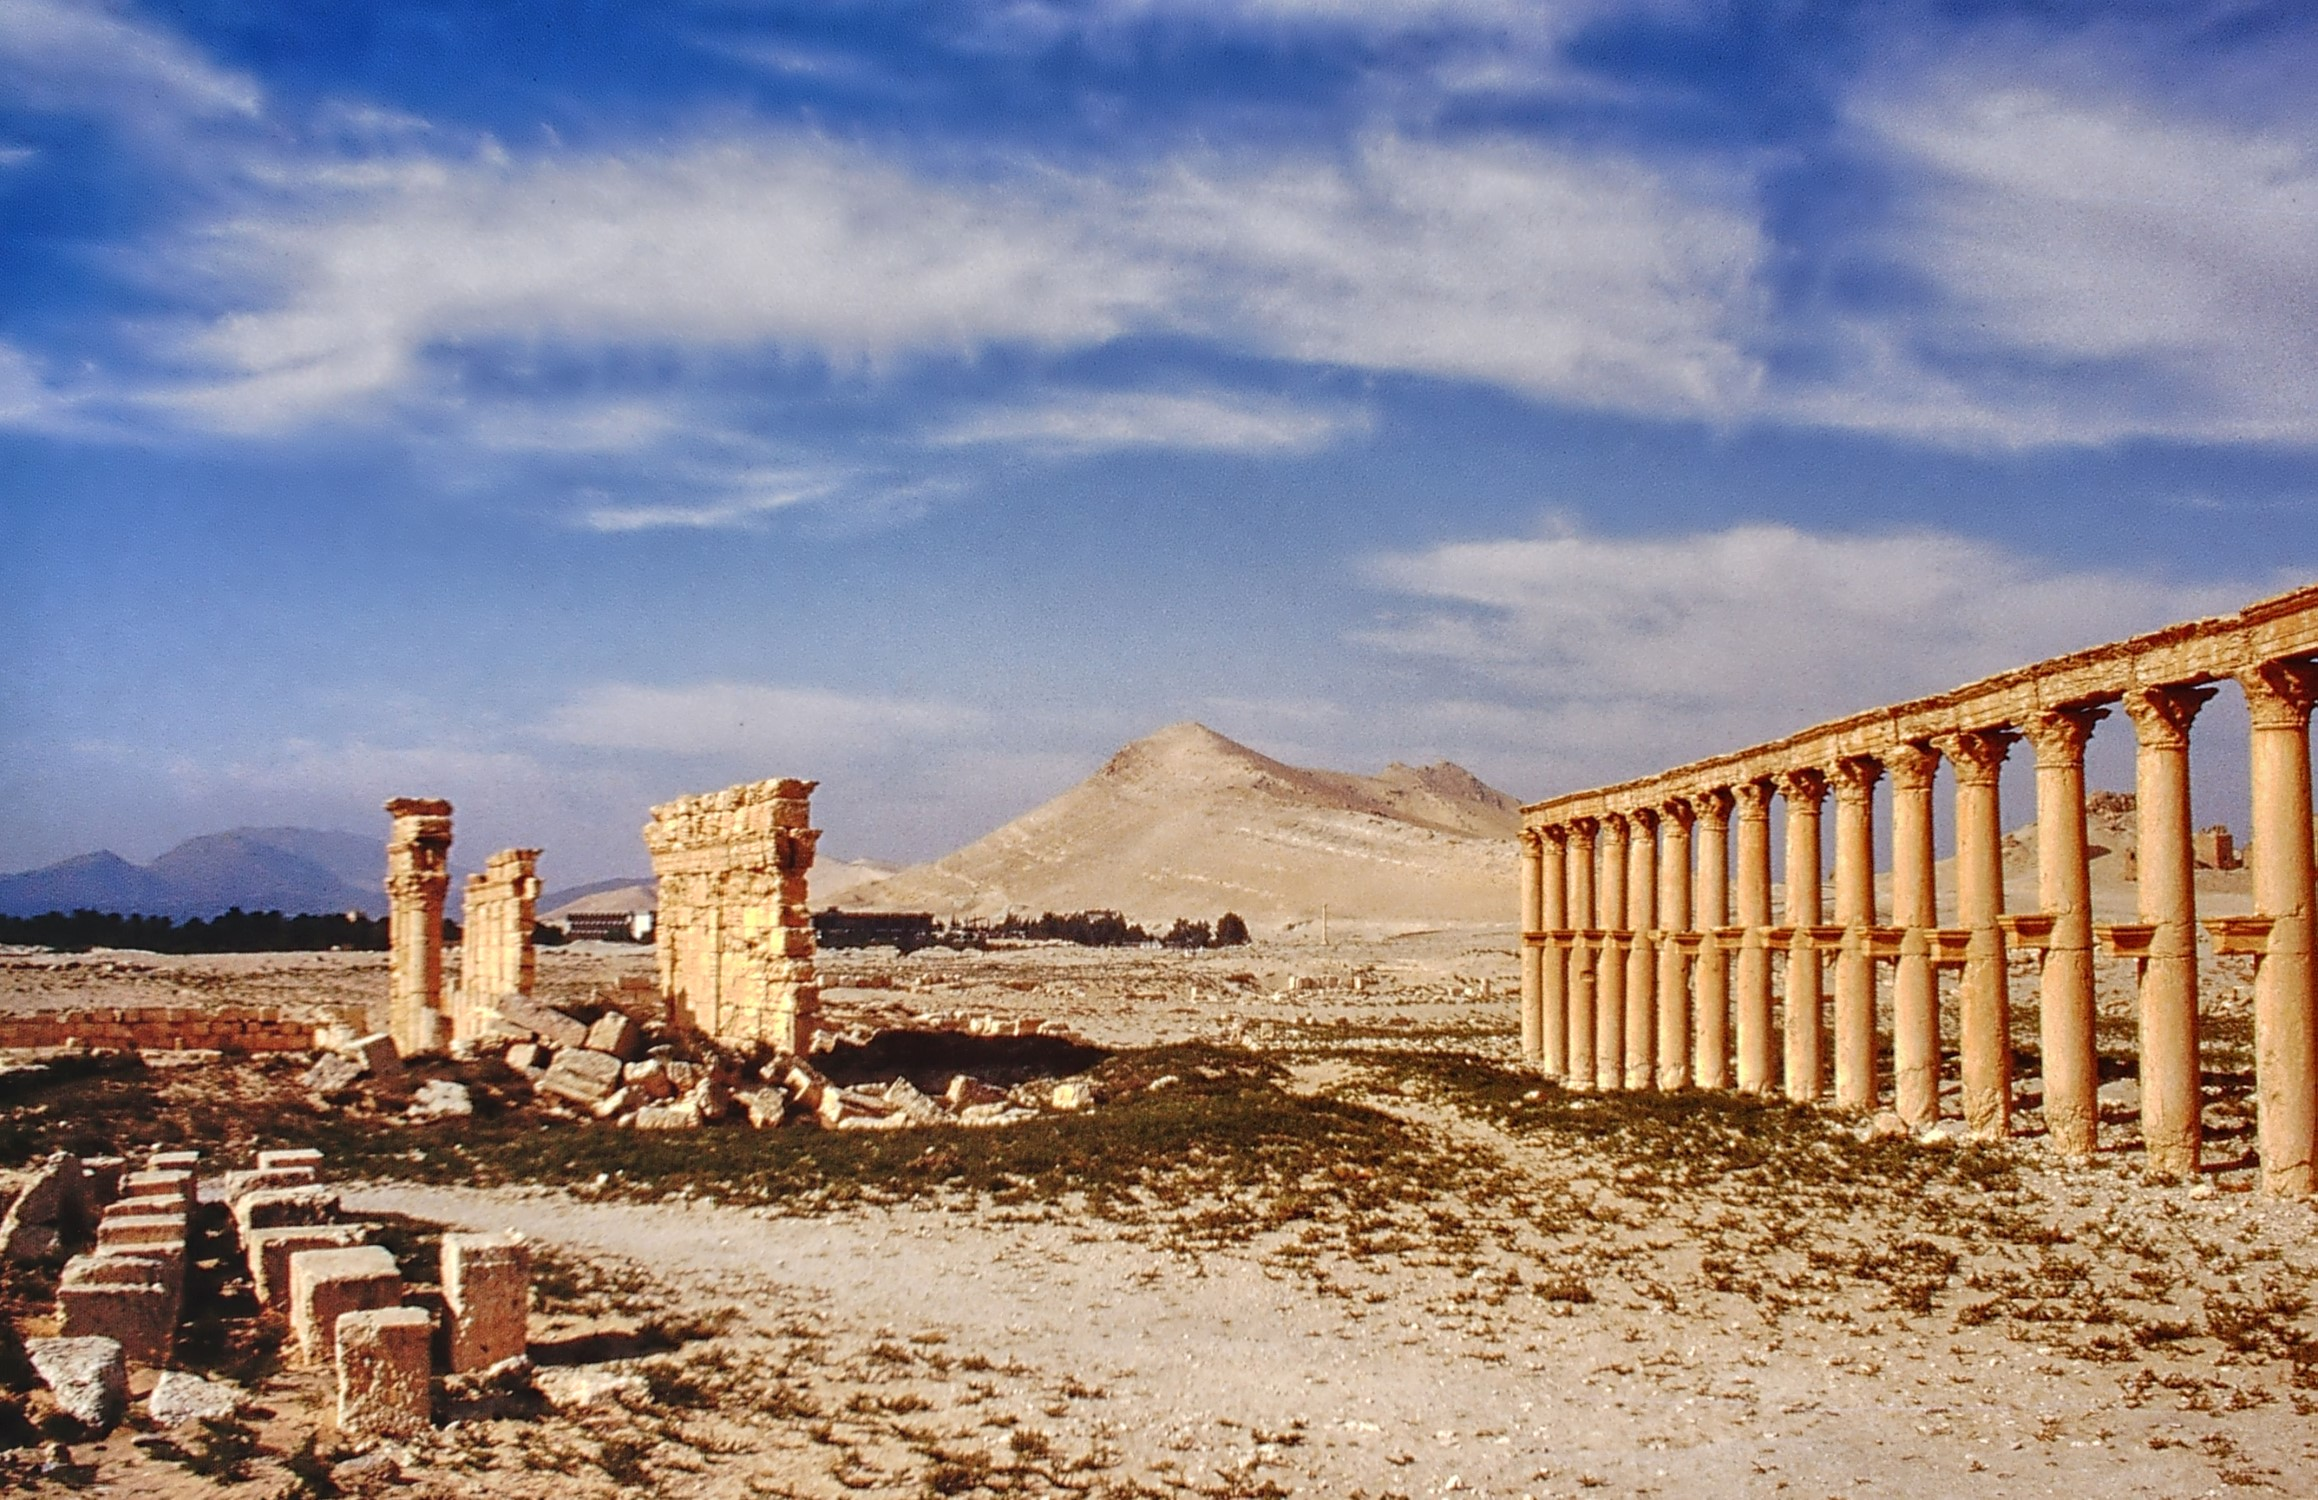 Desert with stone columns